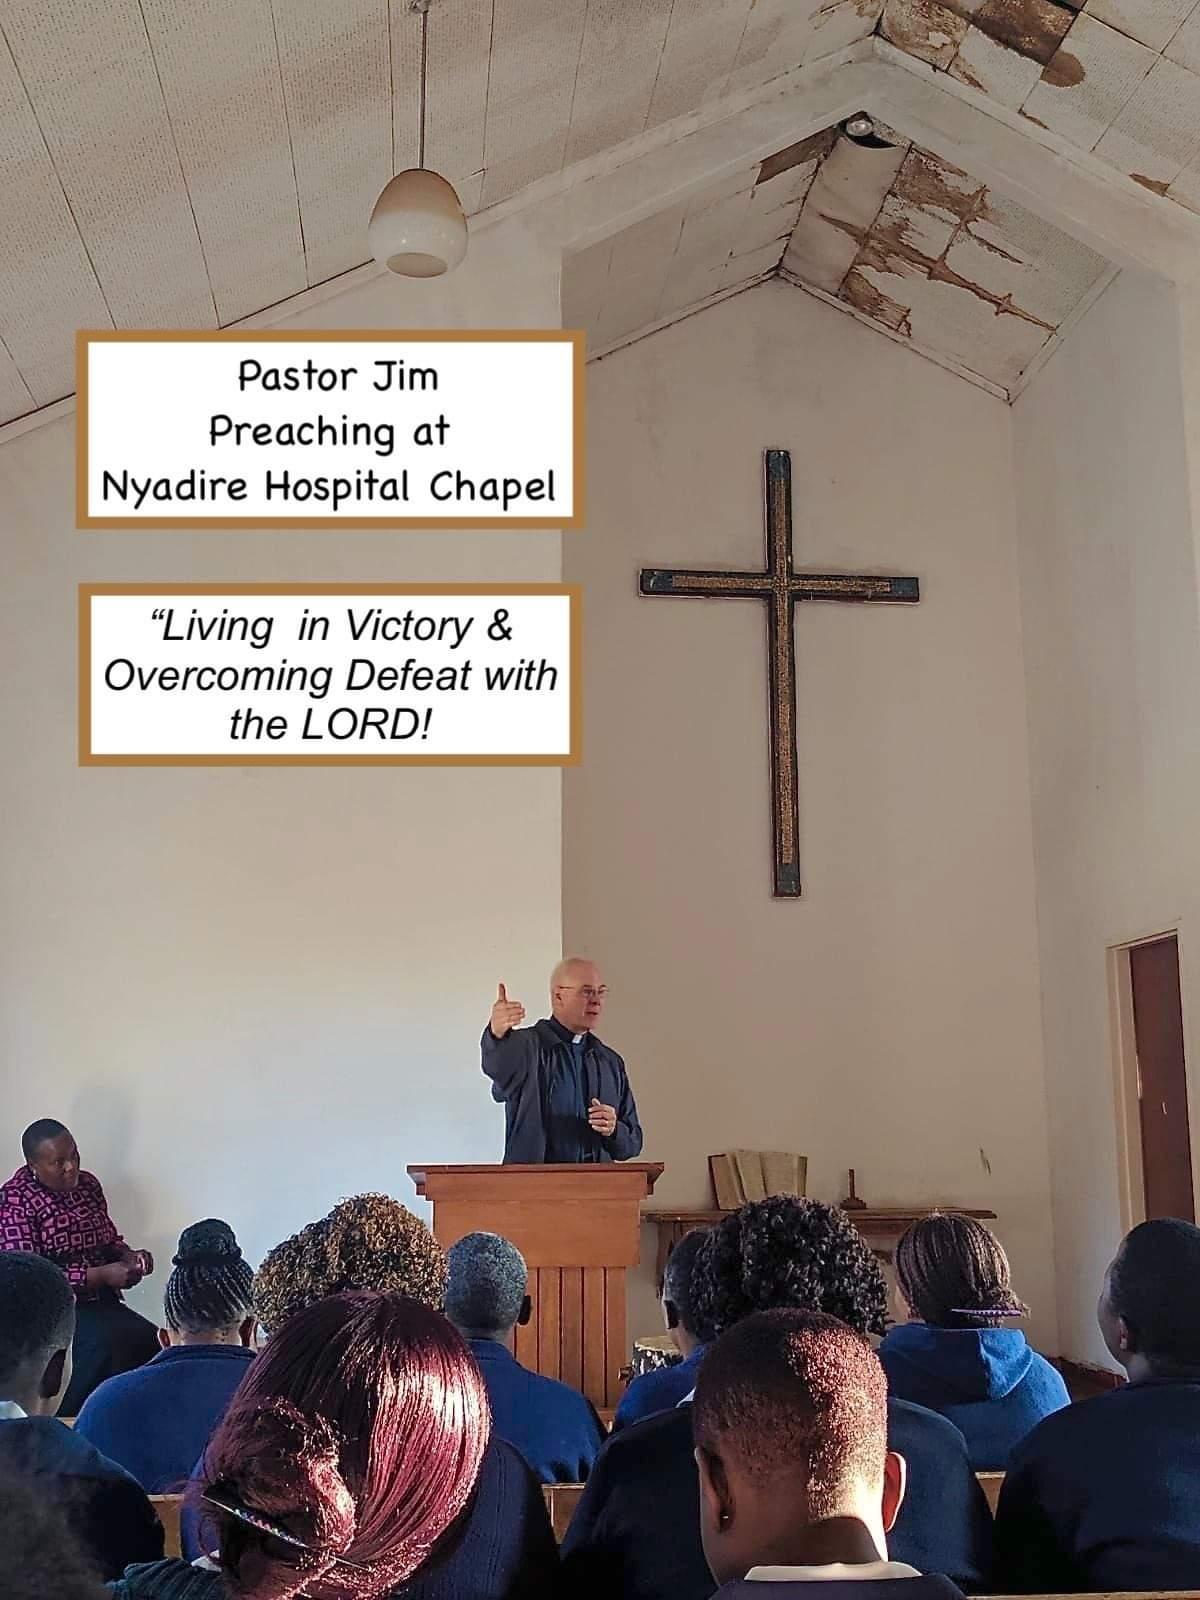 Pastor Jim preaches in Nyadire.